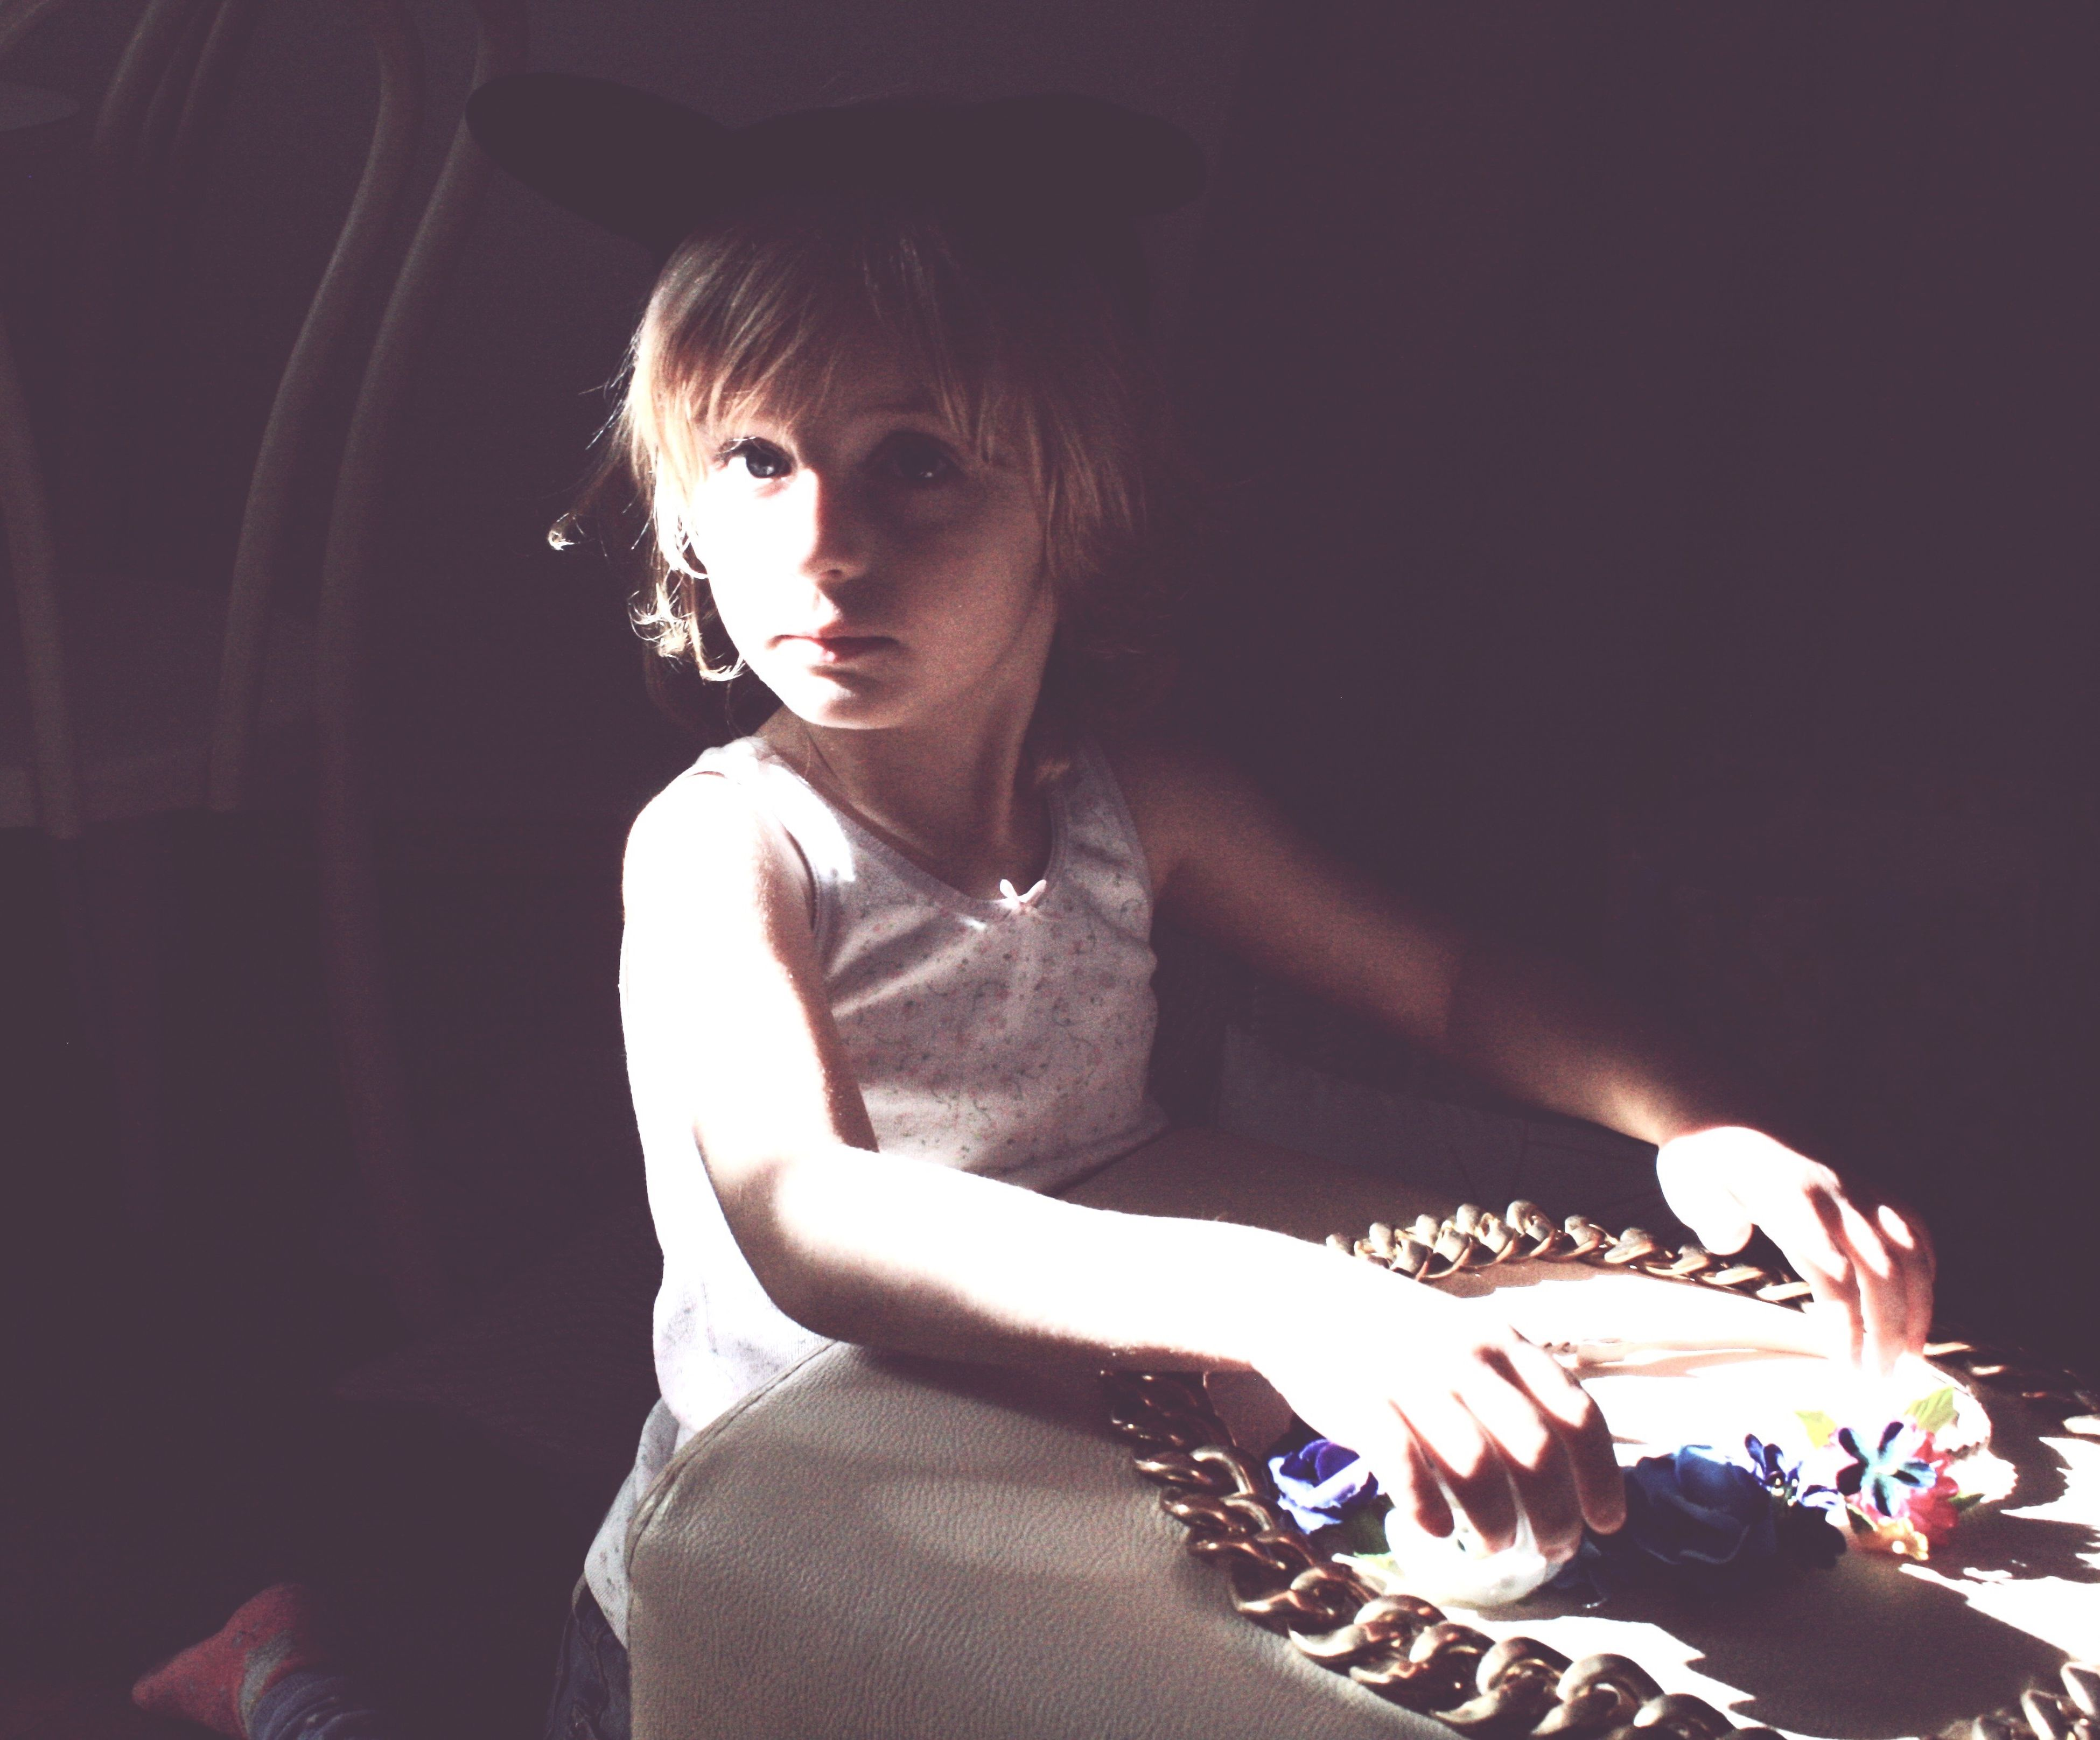 Sunshine #little People Natural Light Portrait #golden Girl